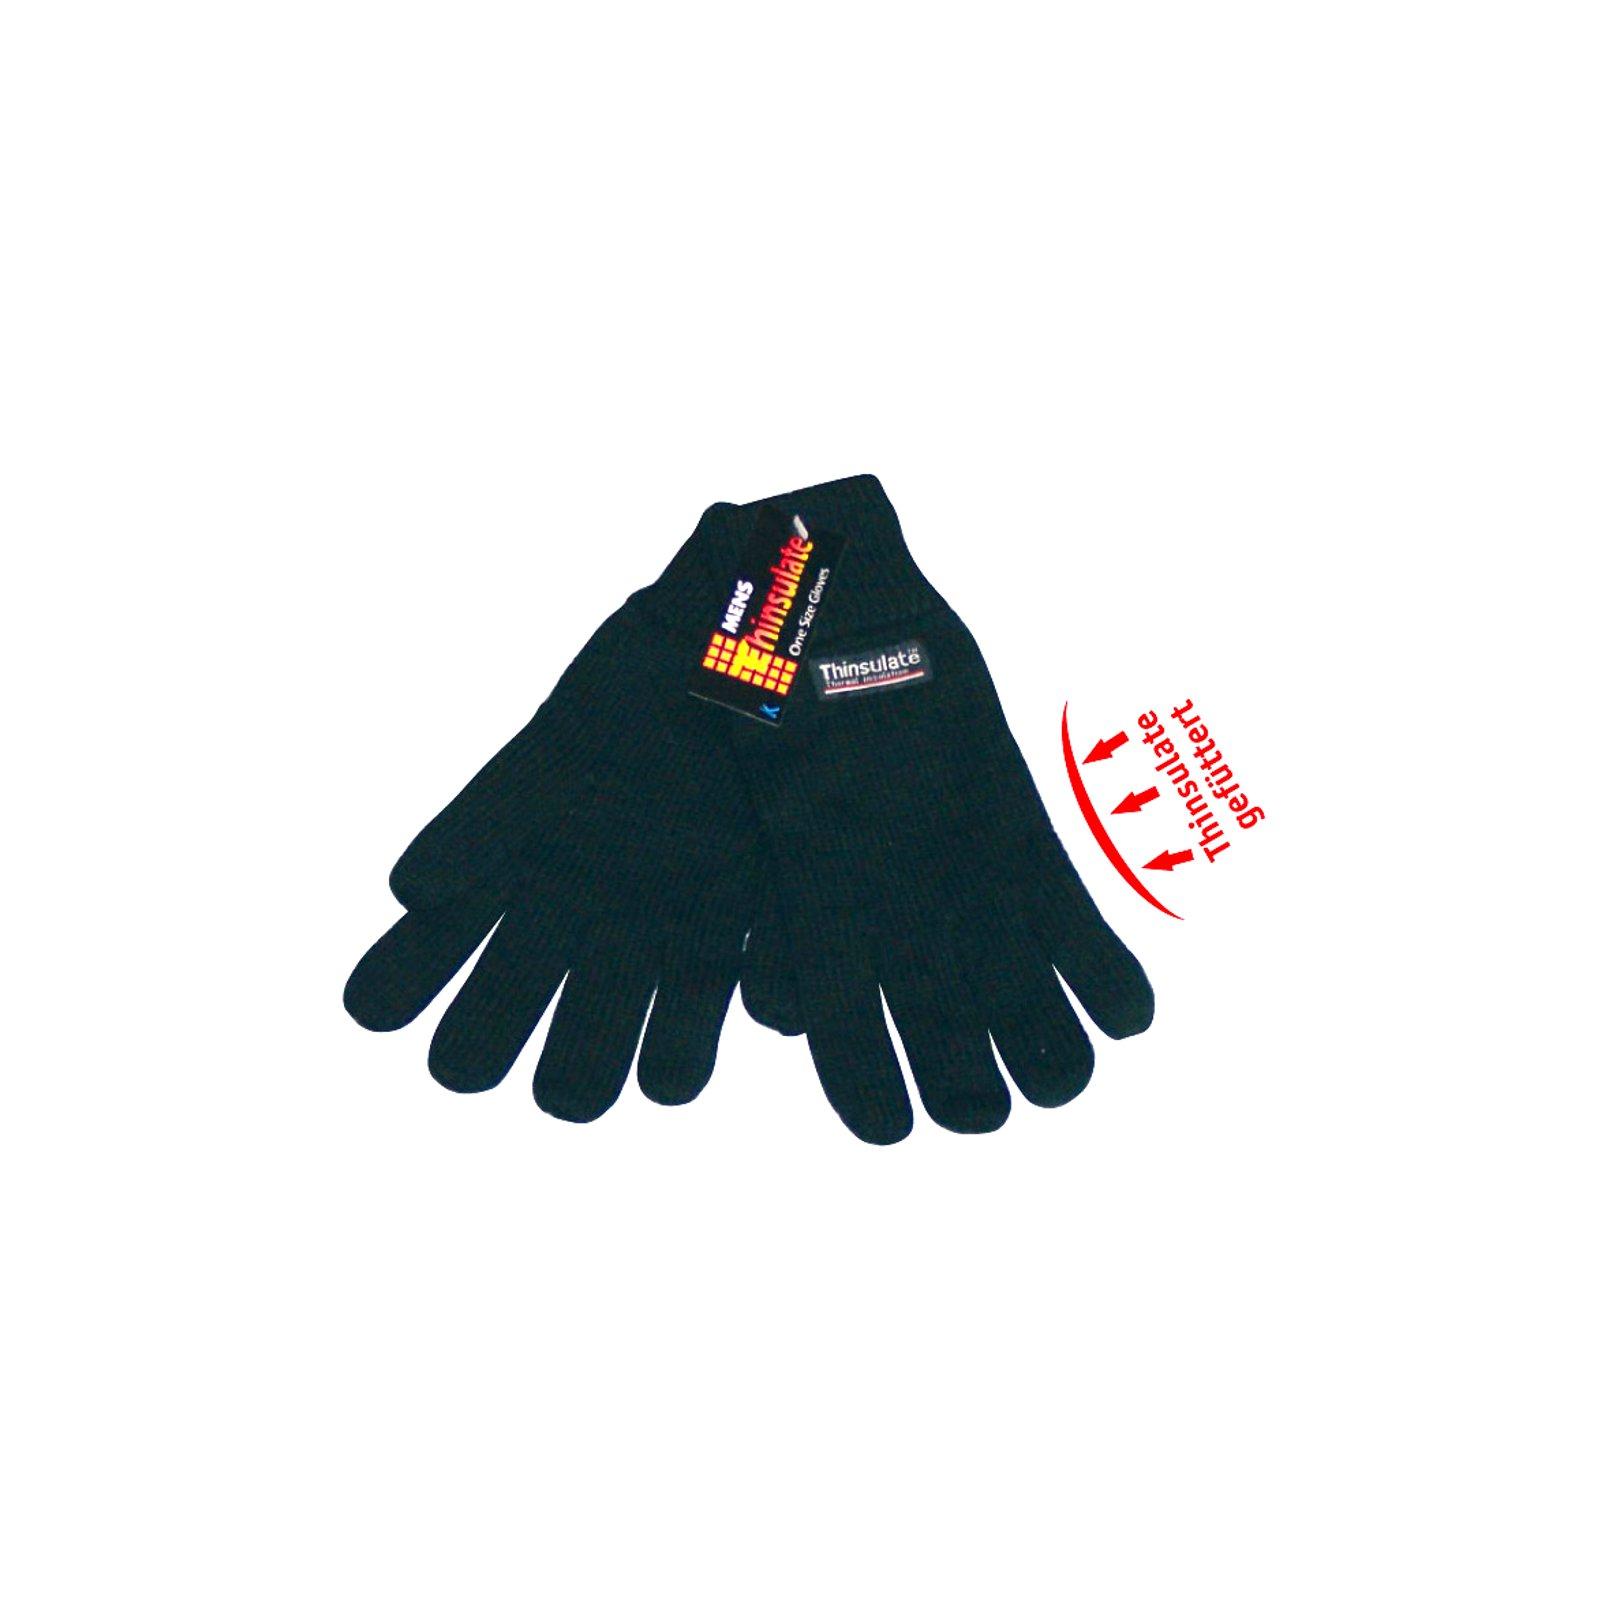 Herren Gepolsterte Handschuhe Thinsulate W/ärme Gef/üttert Ski-Handschuhe Motorrad-Handschuhe Outdoor